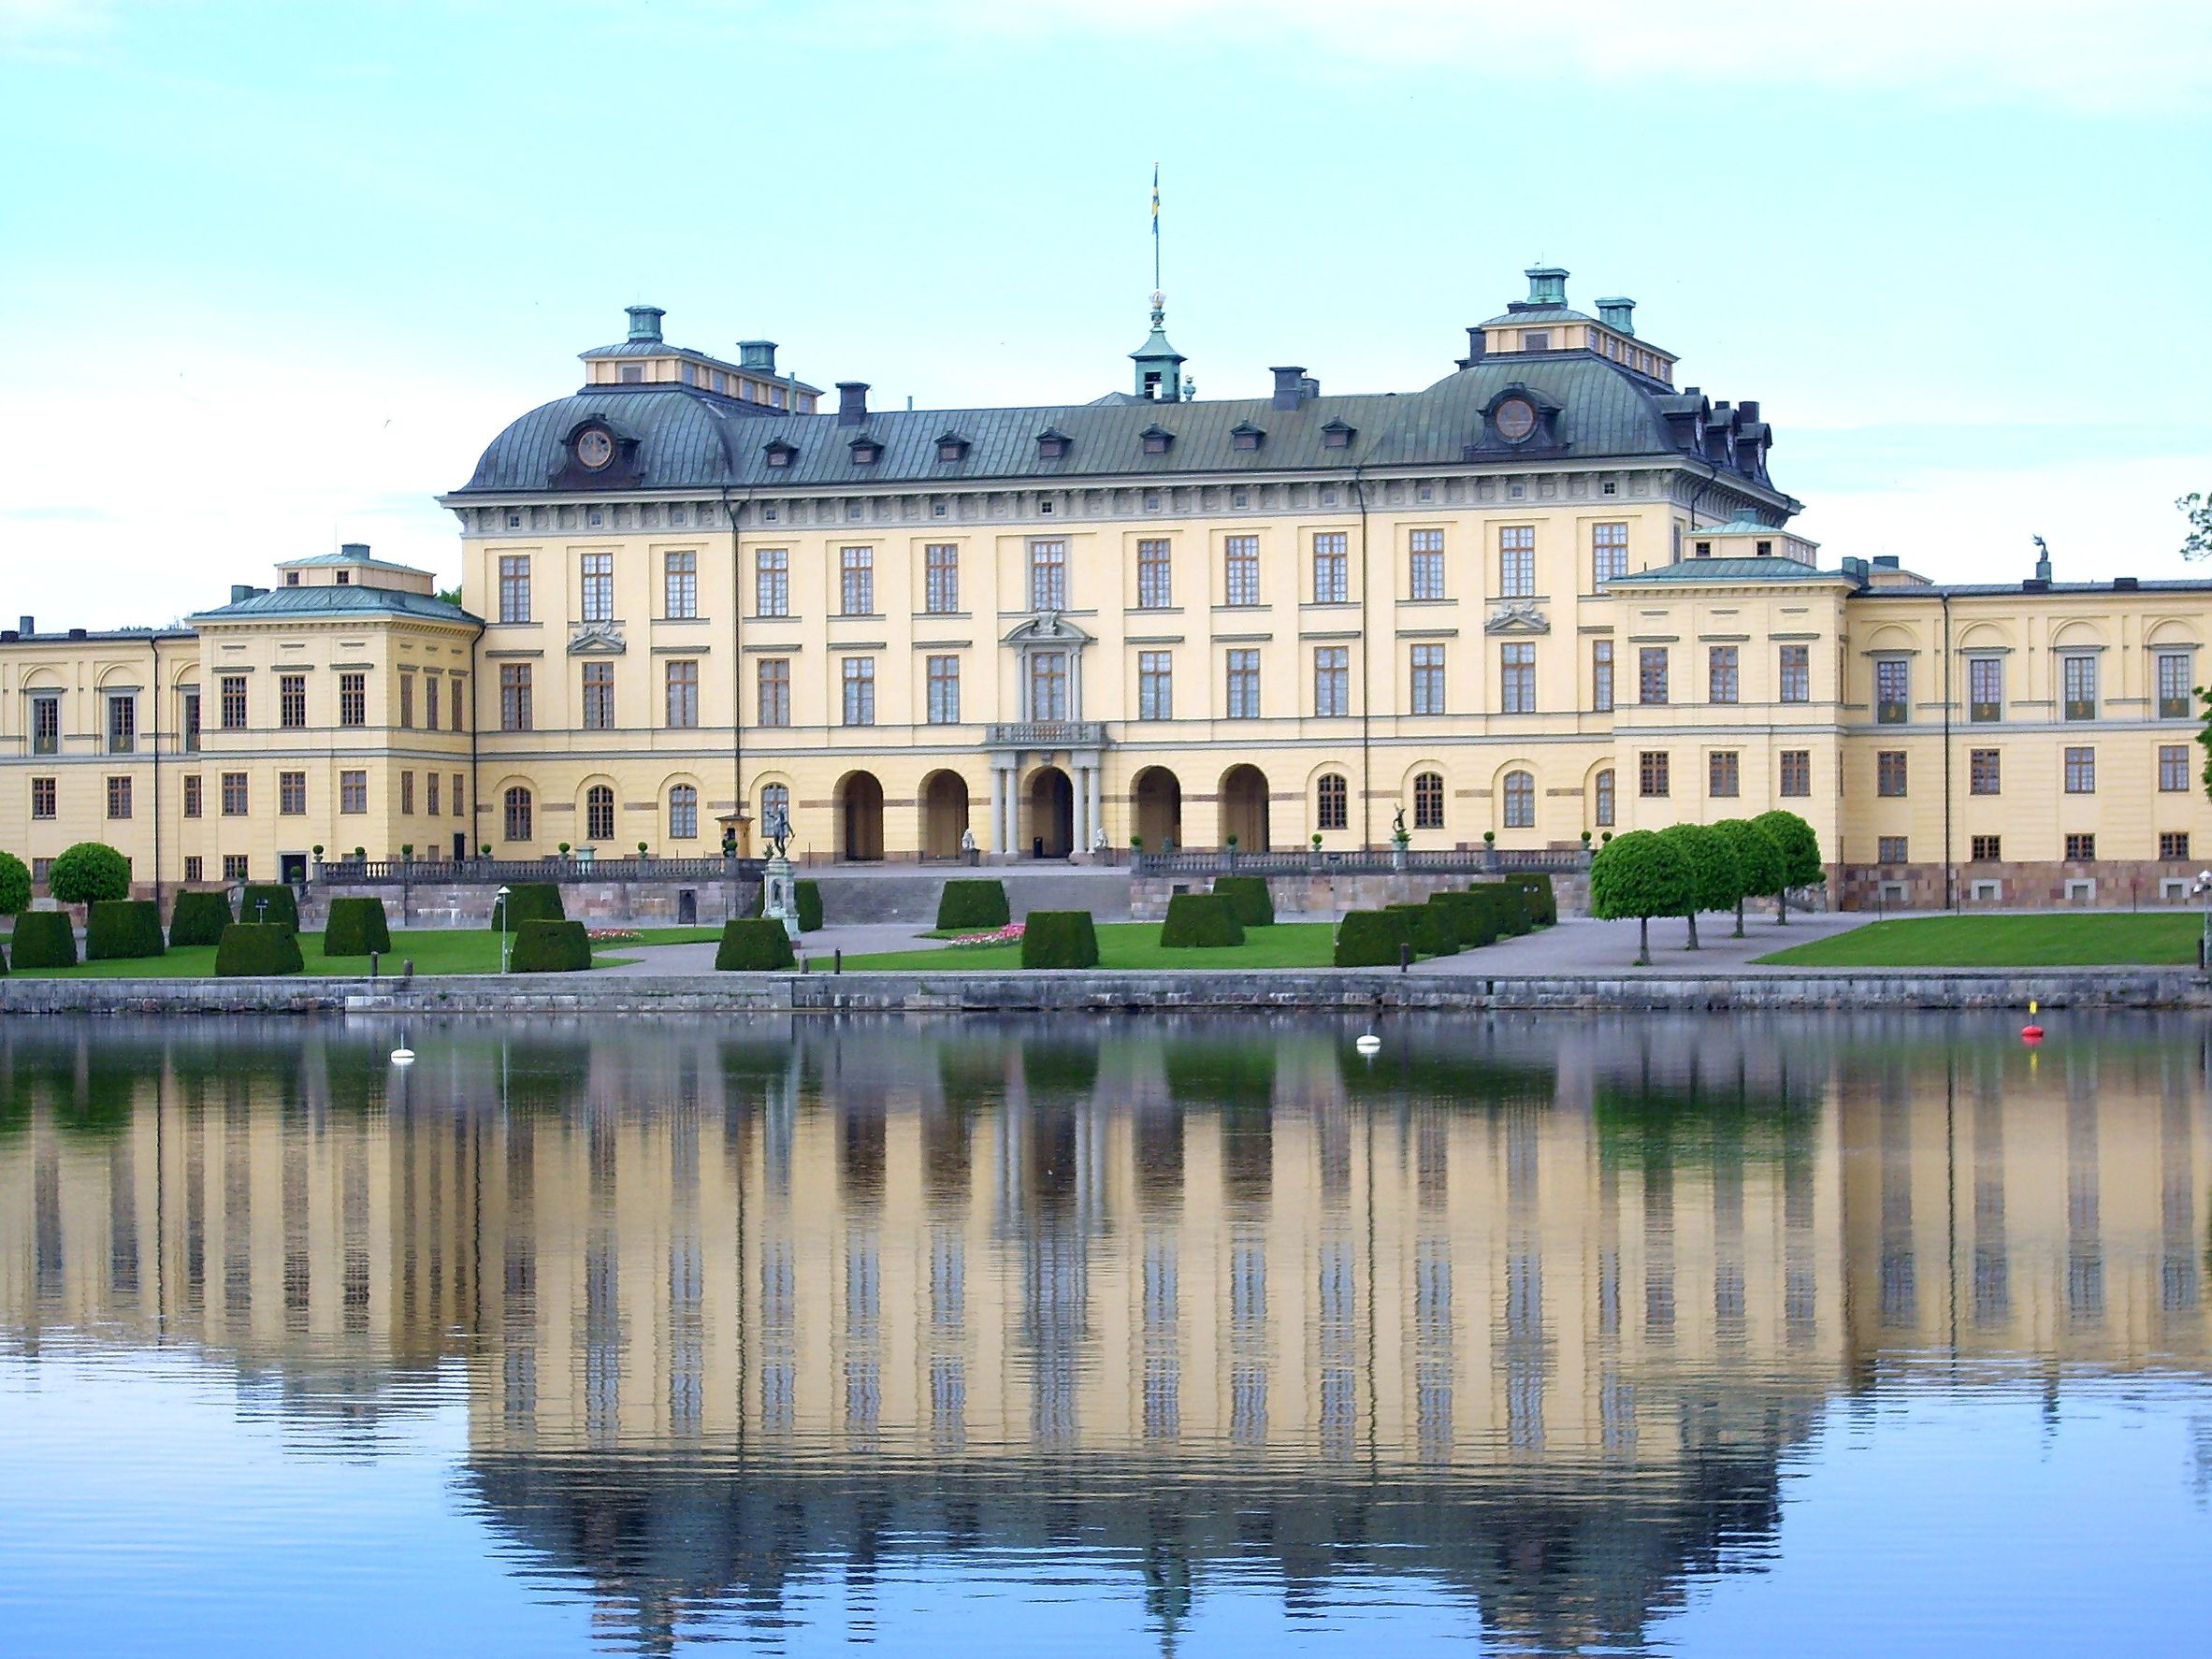 The Drottningholm Palace Stockholm